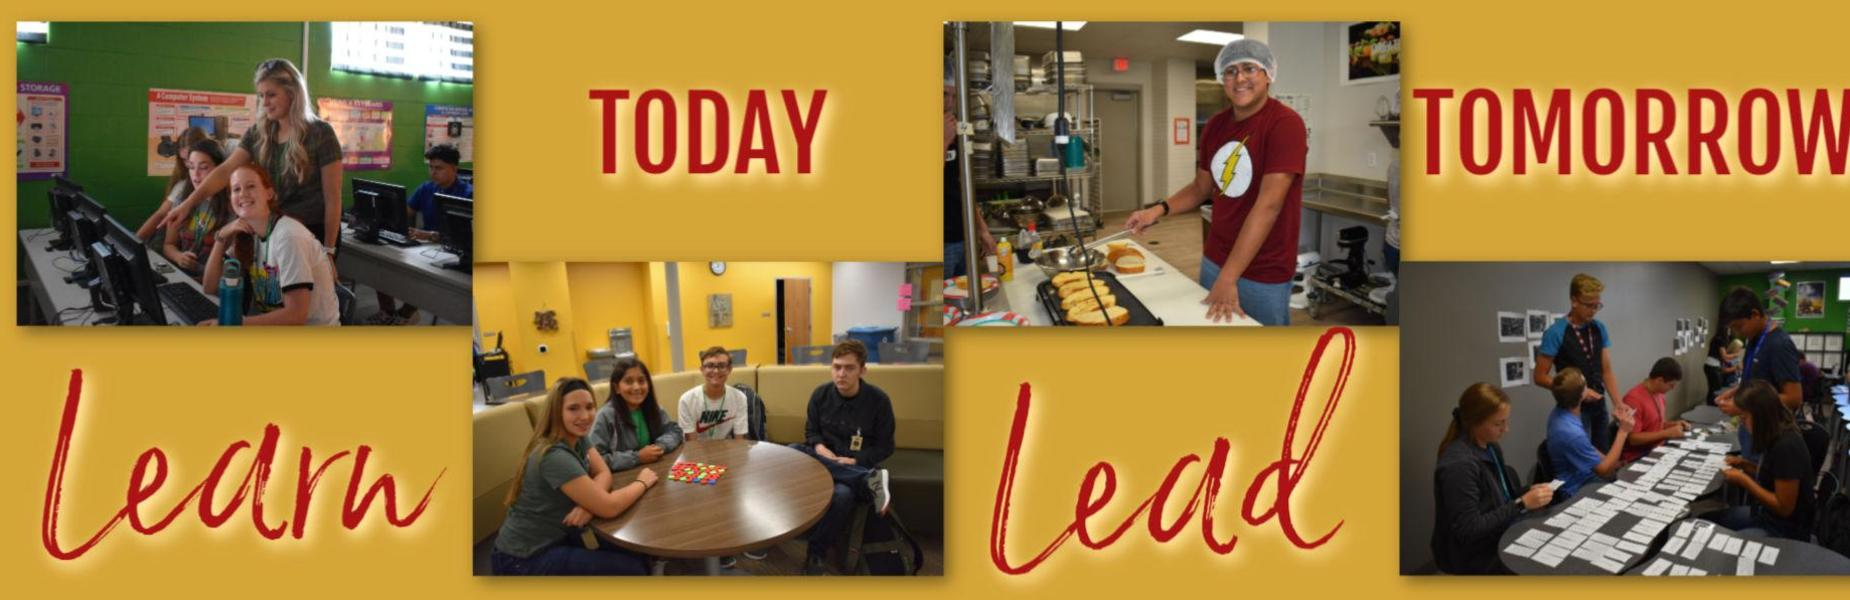 Learn Today-Lead Tomorrow